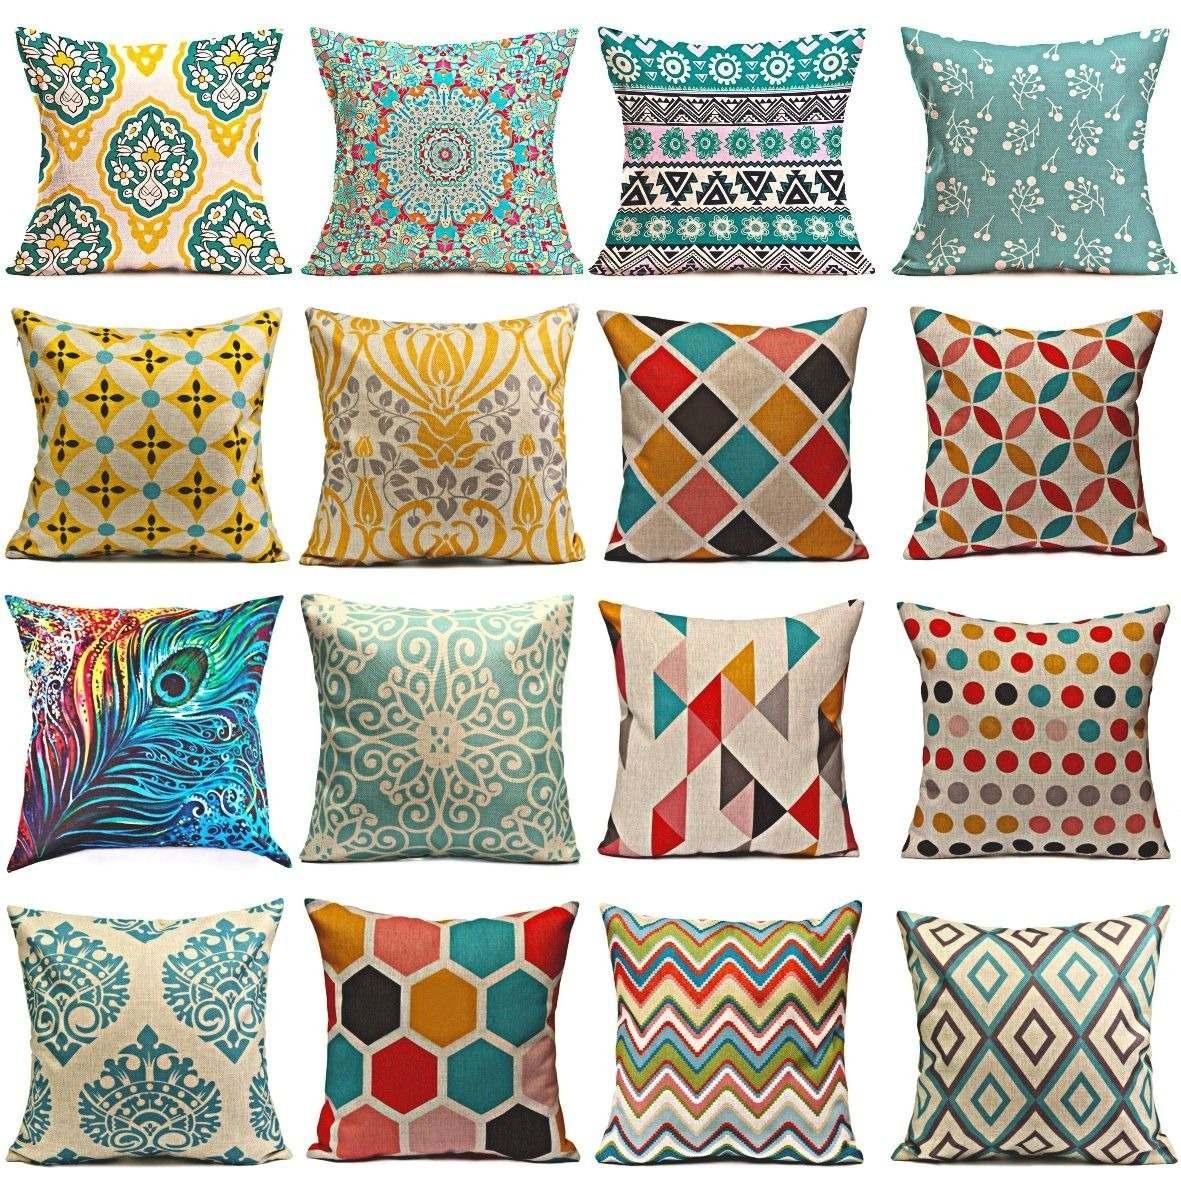 41f0e4cec6b 2 X Funda Cojin Cojines Hoga Casa Decoracion Sofa Cama 45x45 ...